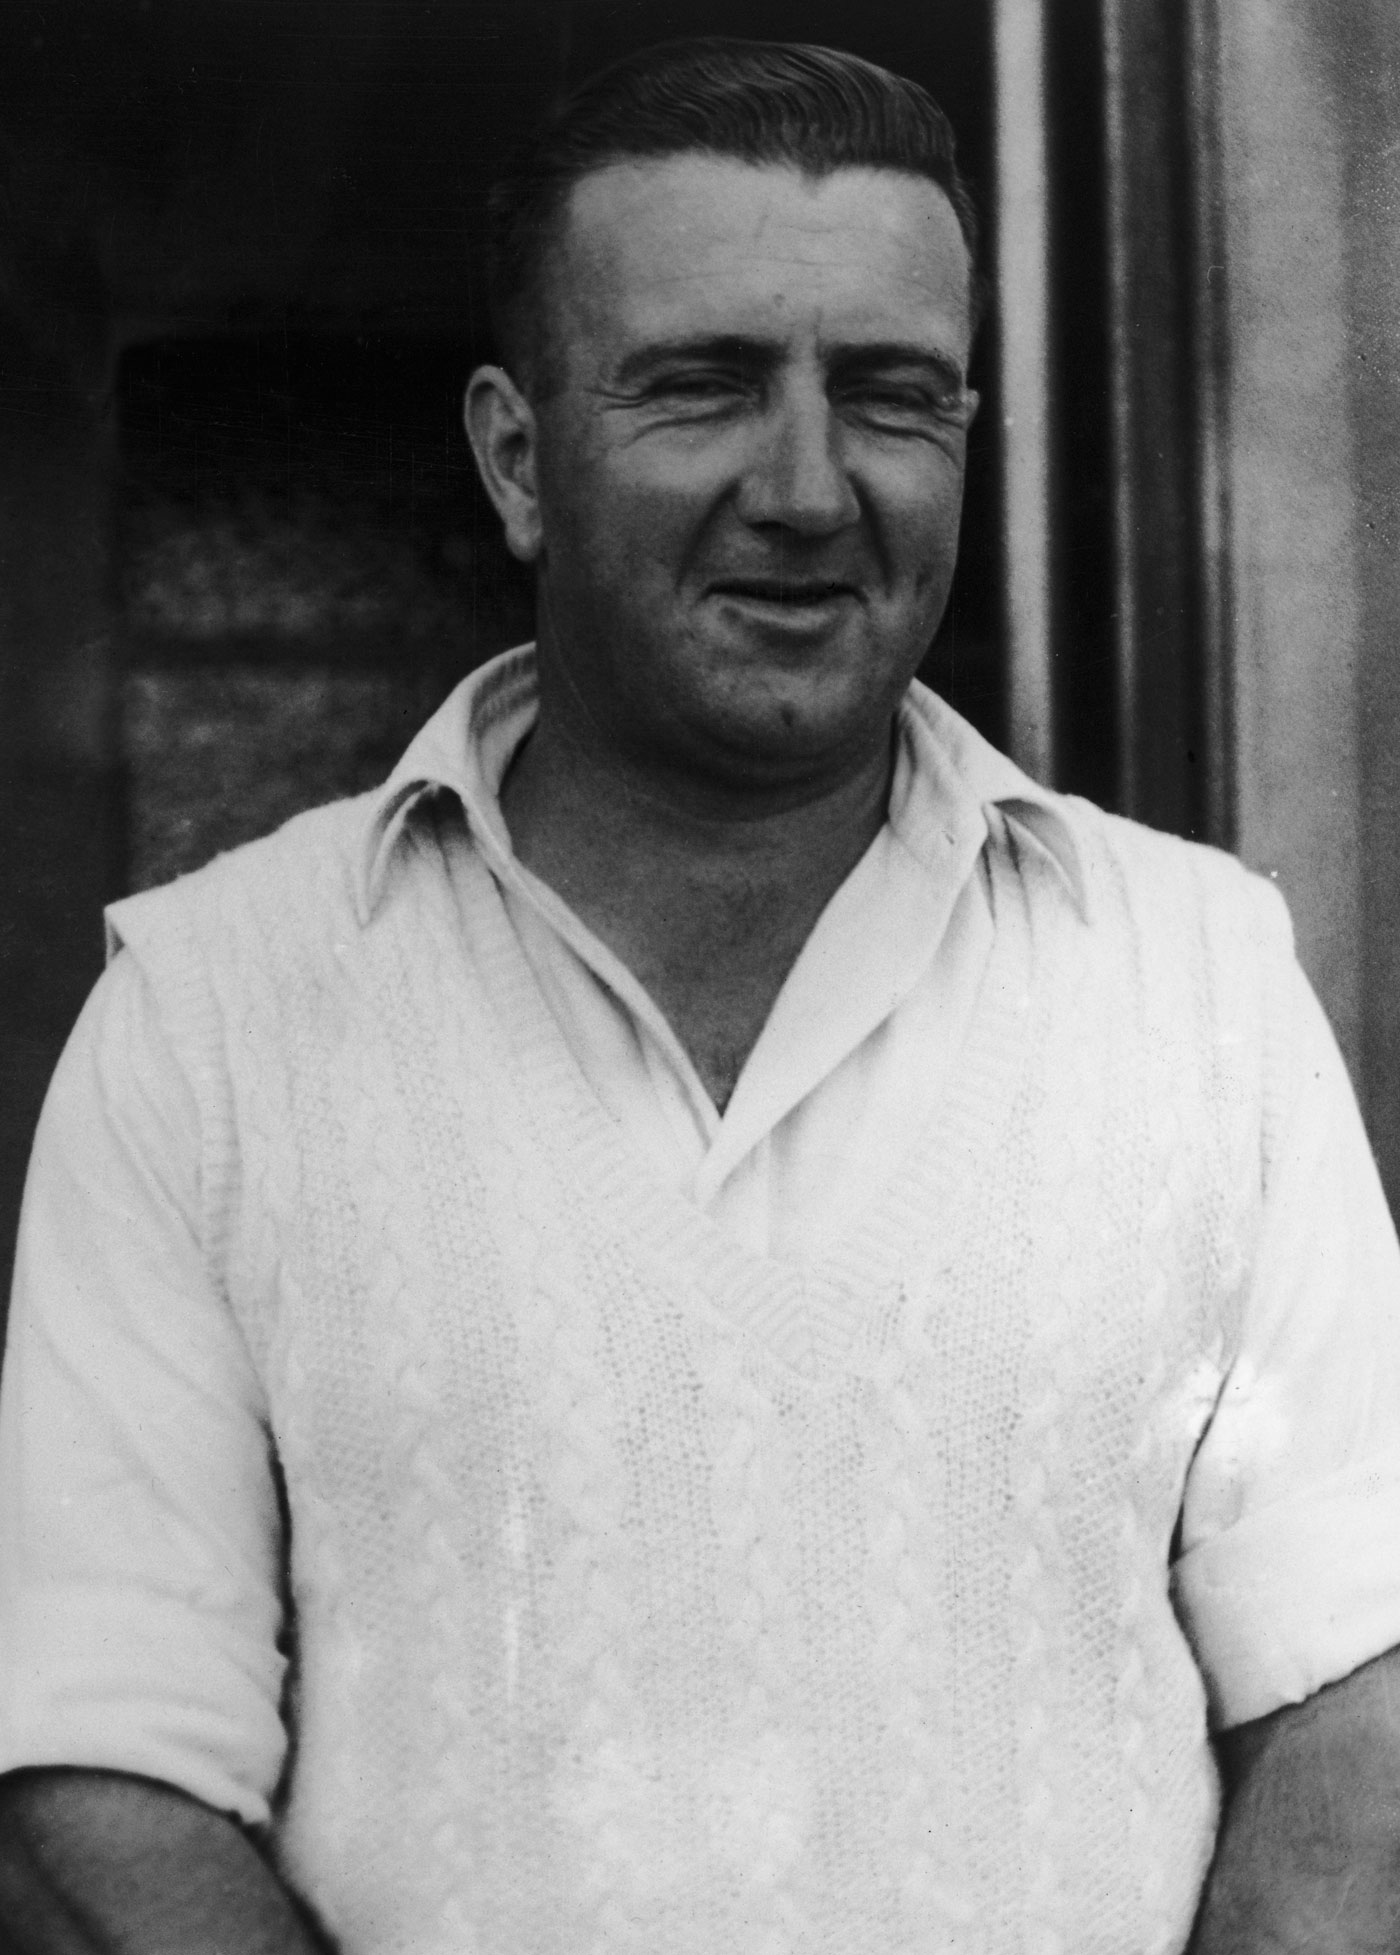 Jack Moroney, player portrait | Cricket Photo | ESPN Cricinfo